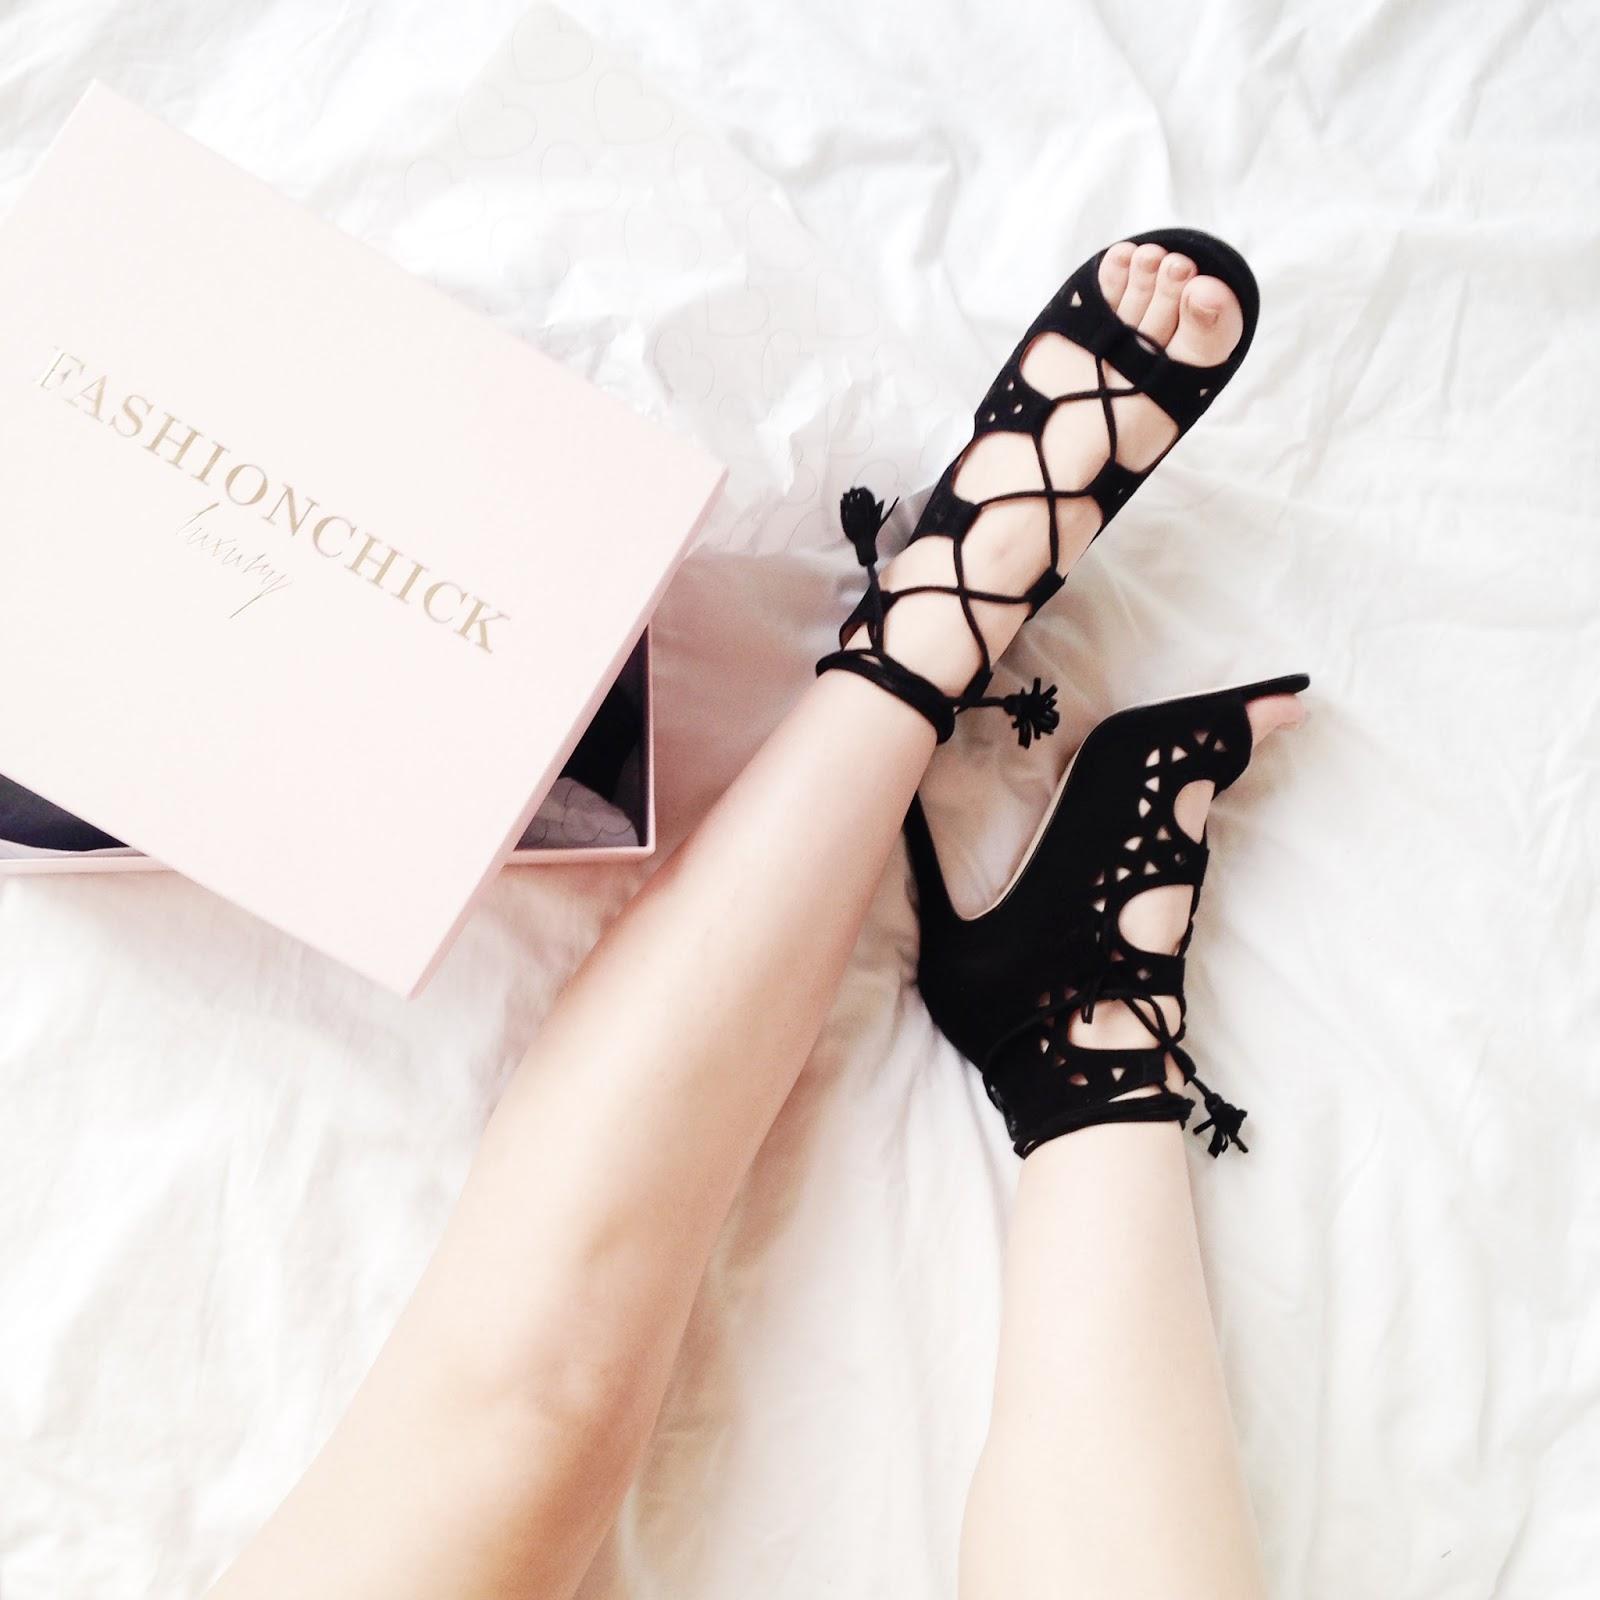 Fashion chick shoes